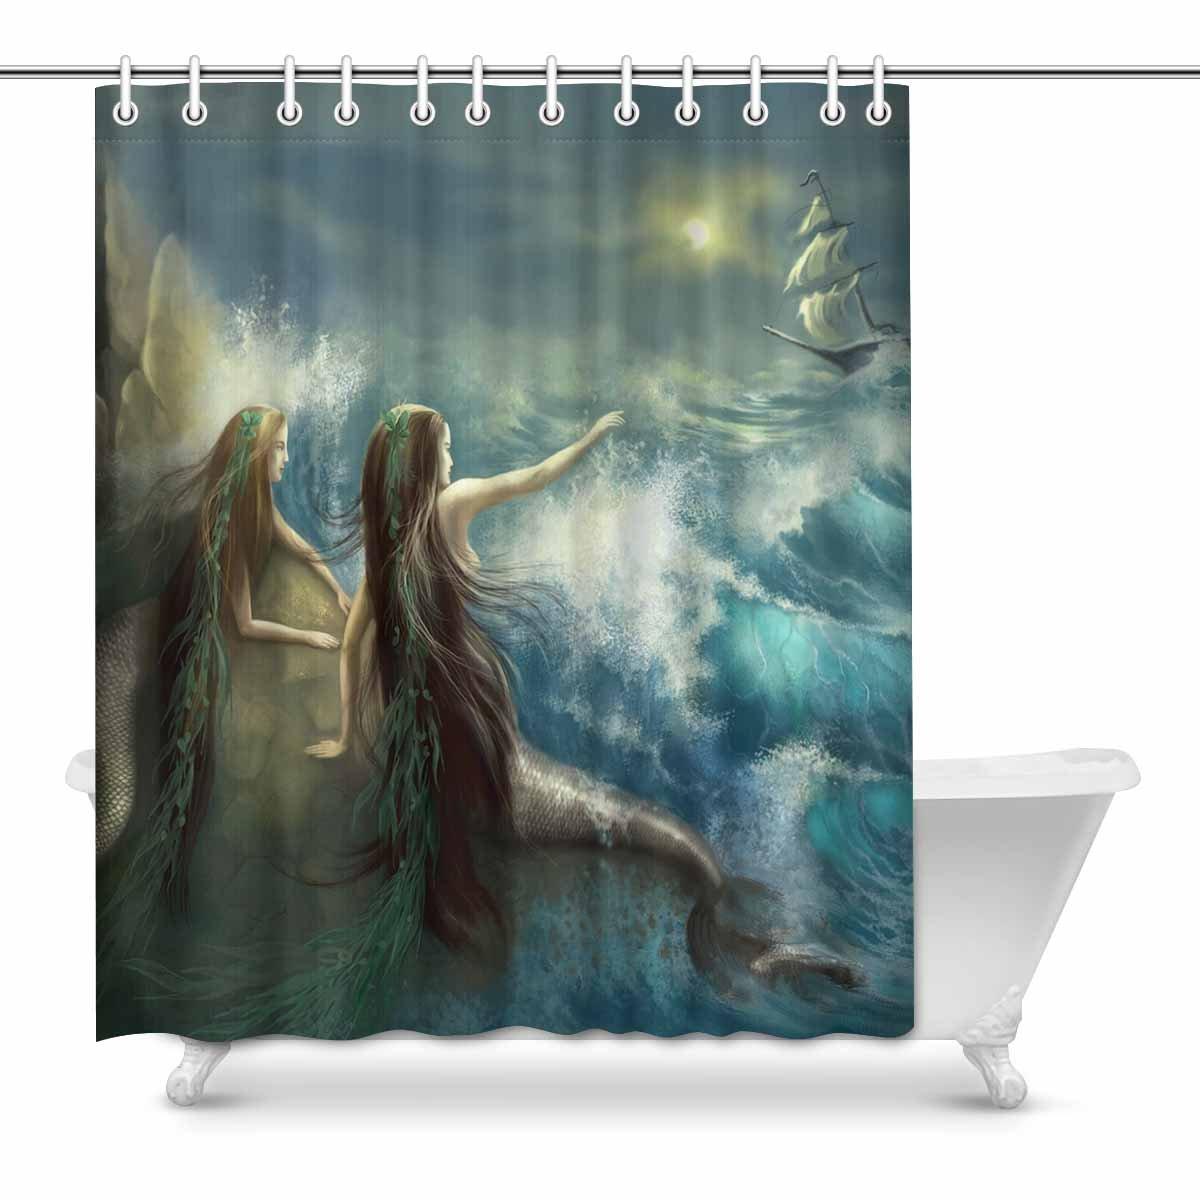 Zblx Palms Ocean Tropical Island Beach Decor Shower Curtain